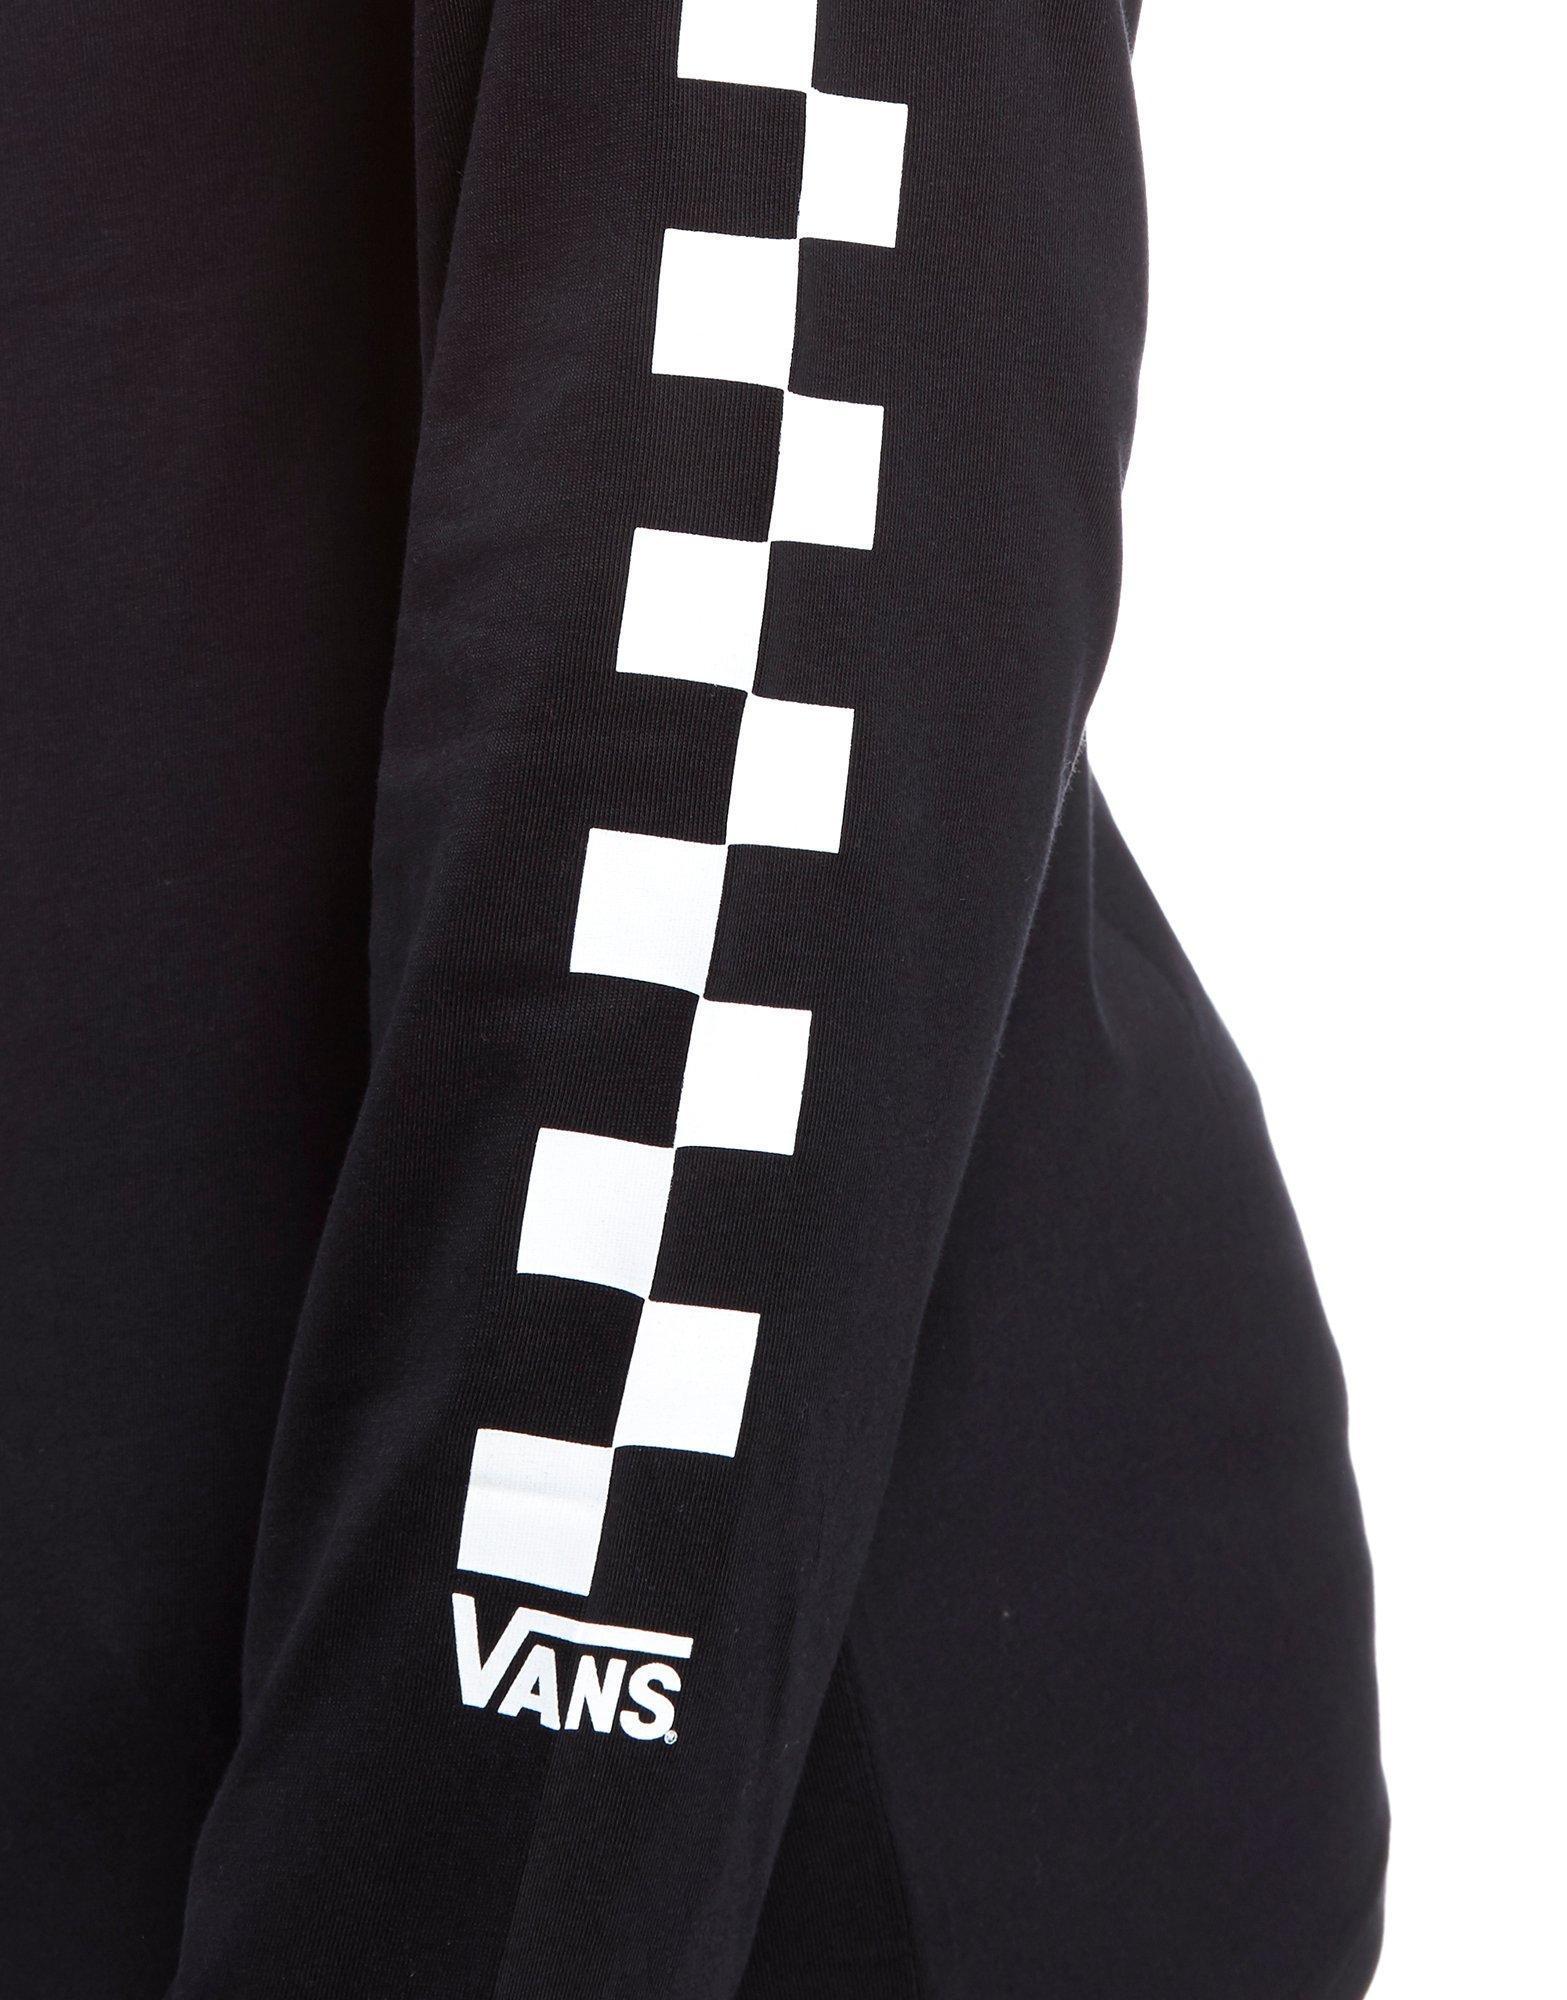 Lyst - Vans Checkerboard Long Sleeve T-shirt in Black for Men 2b870ac55